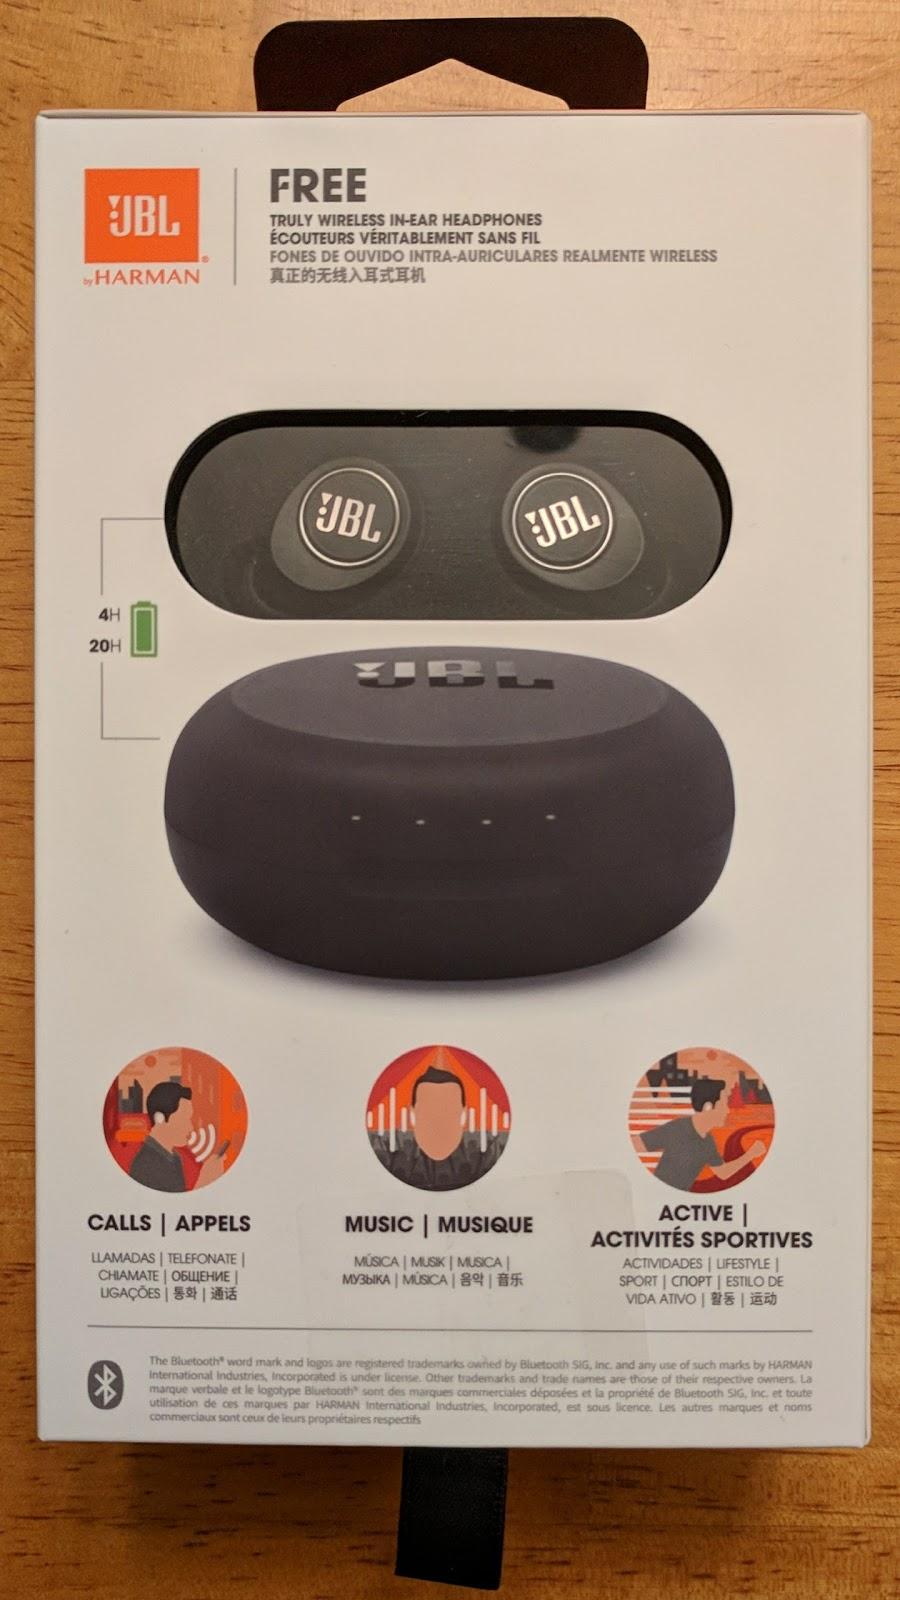 Bryan Hill's Blog: Product Review: JBL - Free True Wireless